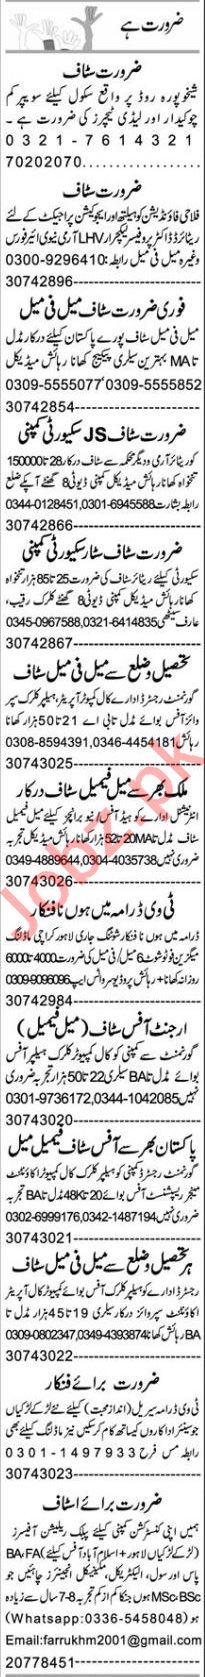 Express Sunday Faisalabad Classified Ads 13 Sep 2020